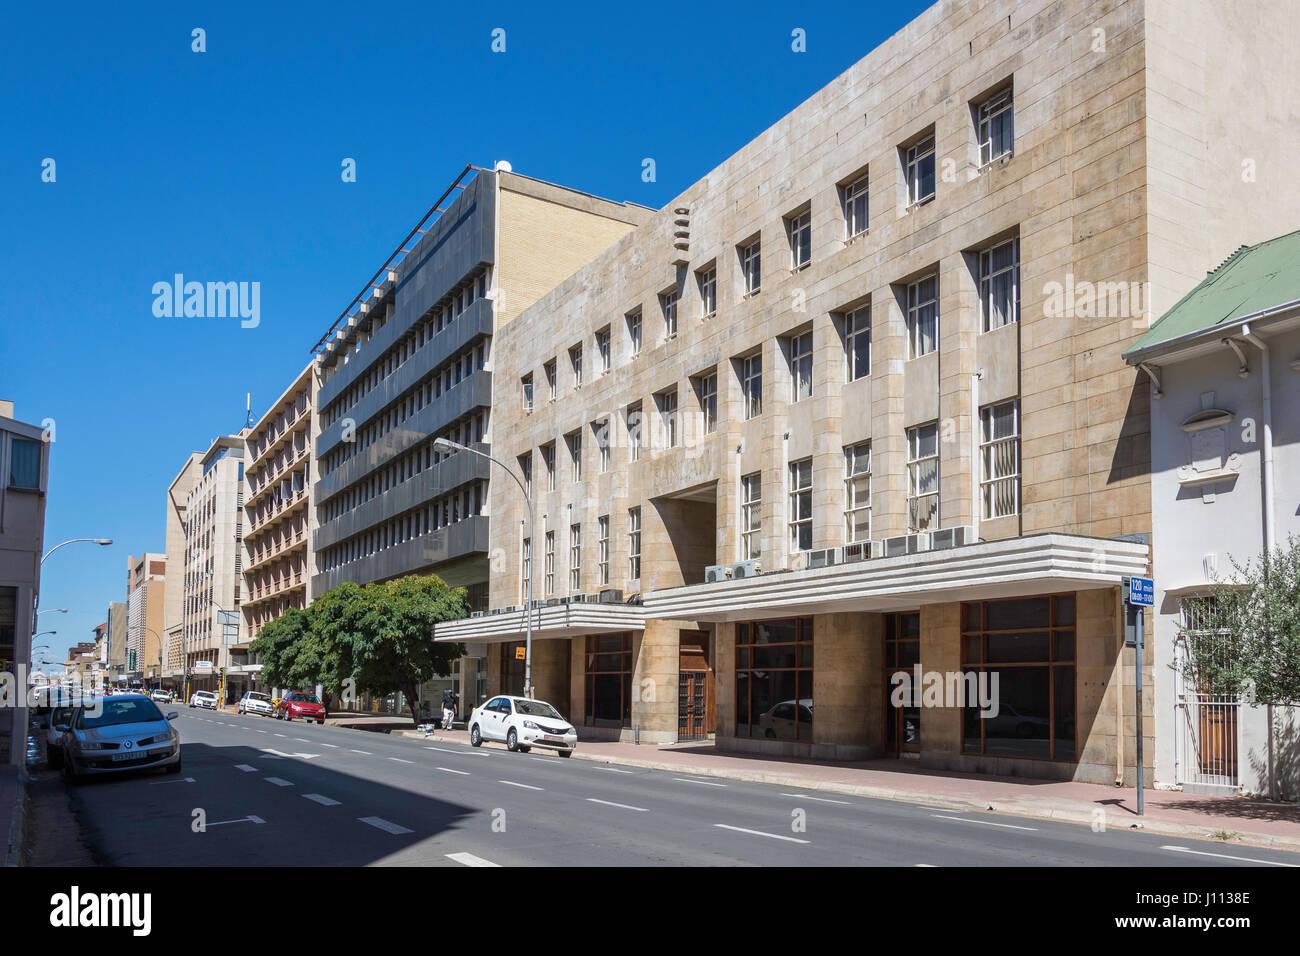 Charlotte Maxeke Street, Bloemfontein, Free State Province, Republic of South Africa - Stock Image